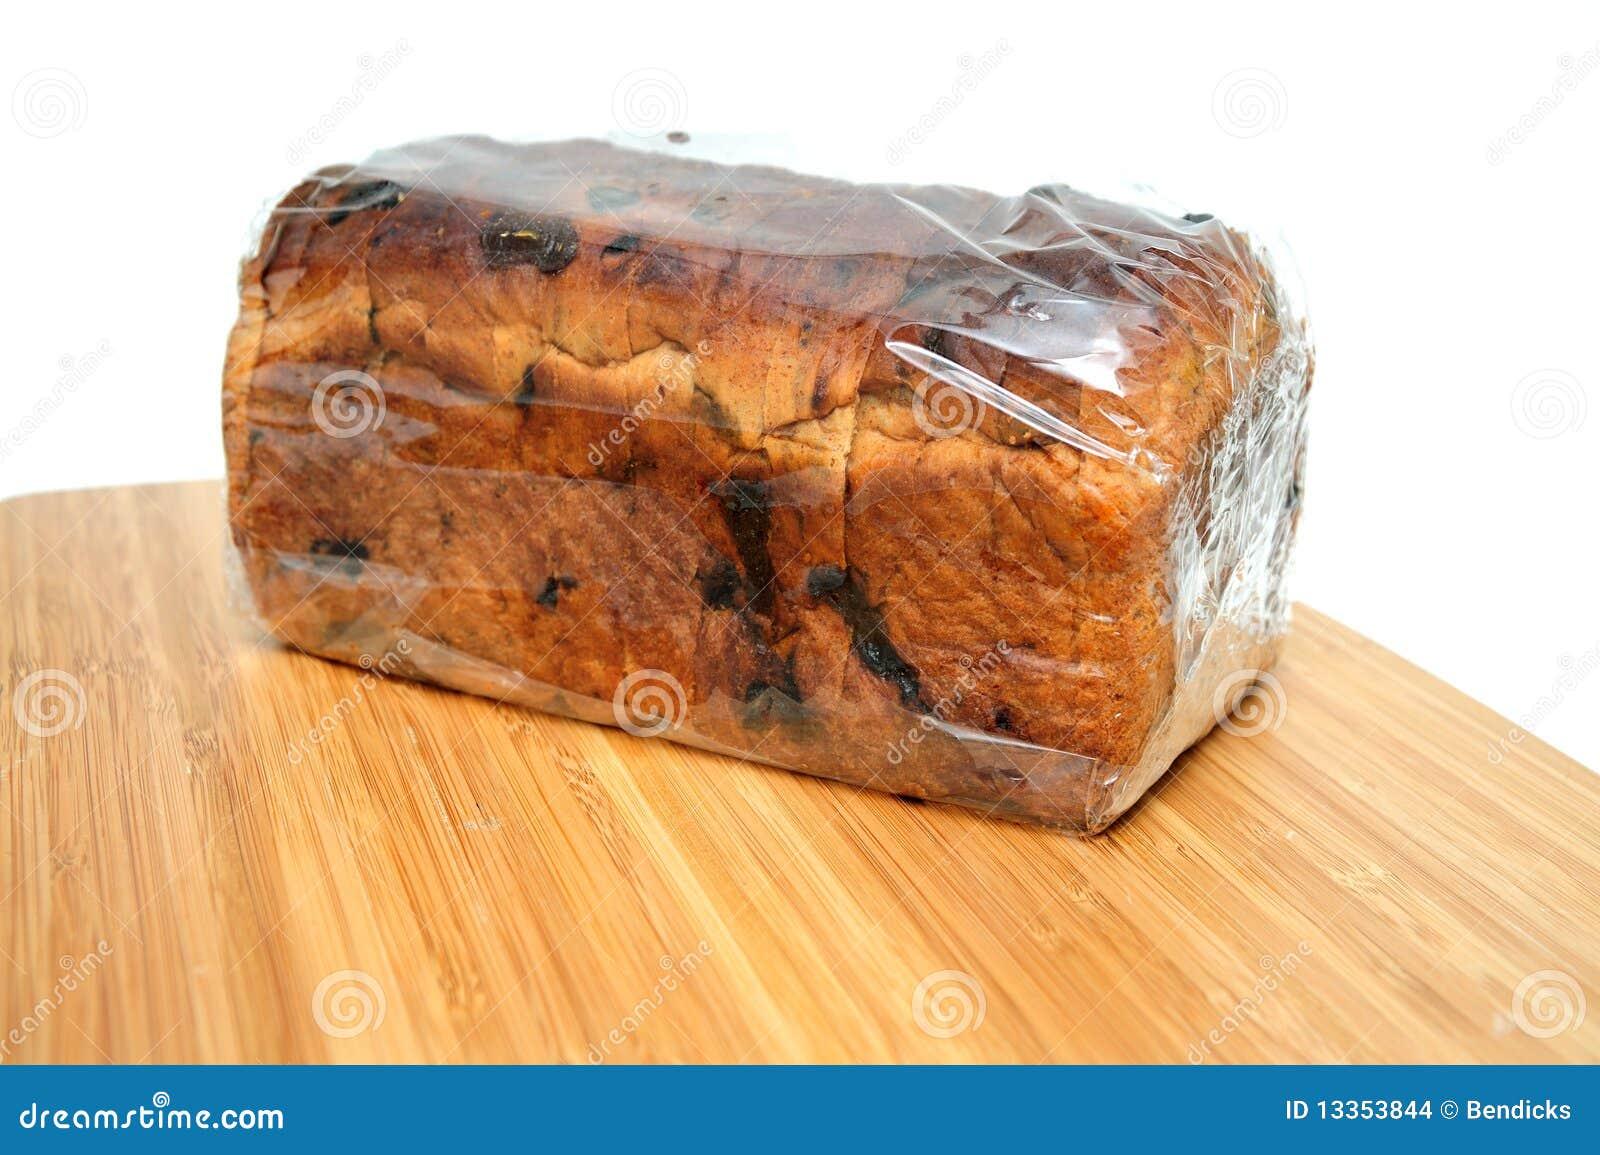 Raisin Cinnamon Bread Loaf Stock Images - Image: 13353844